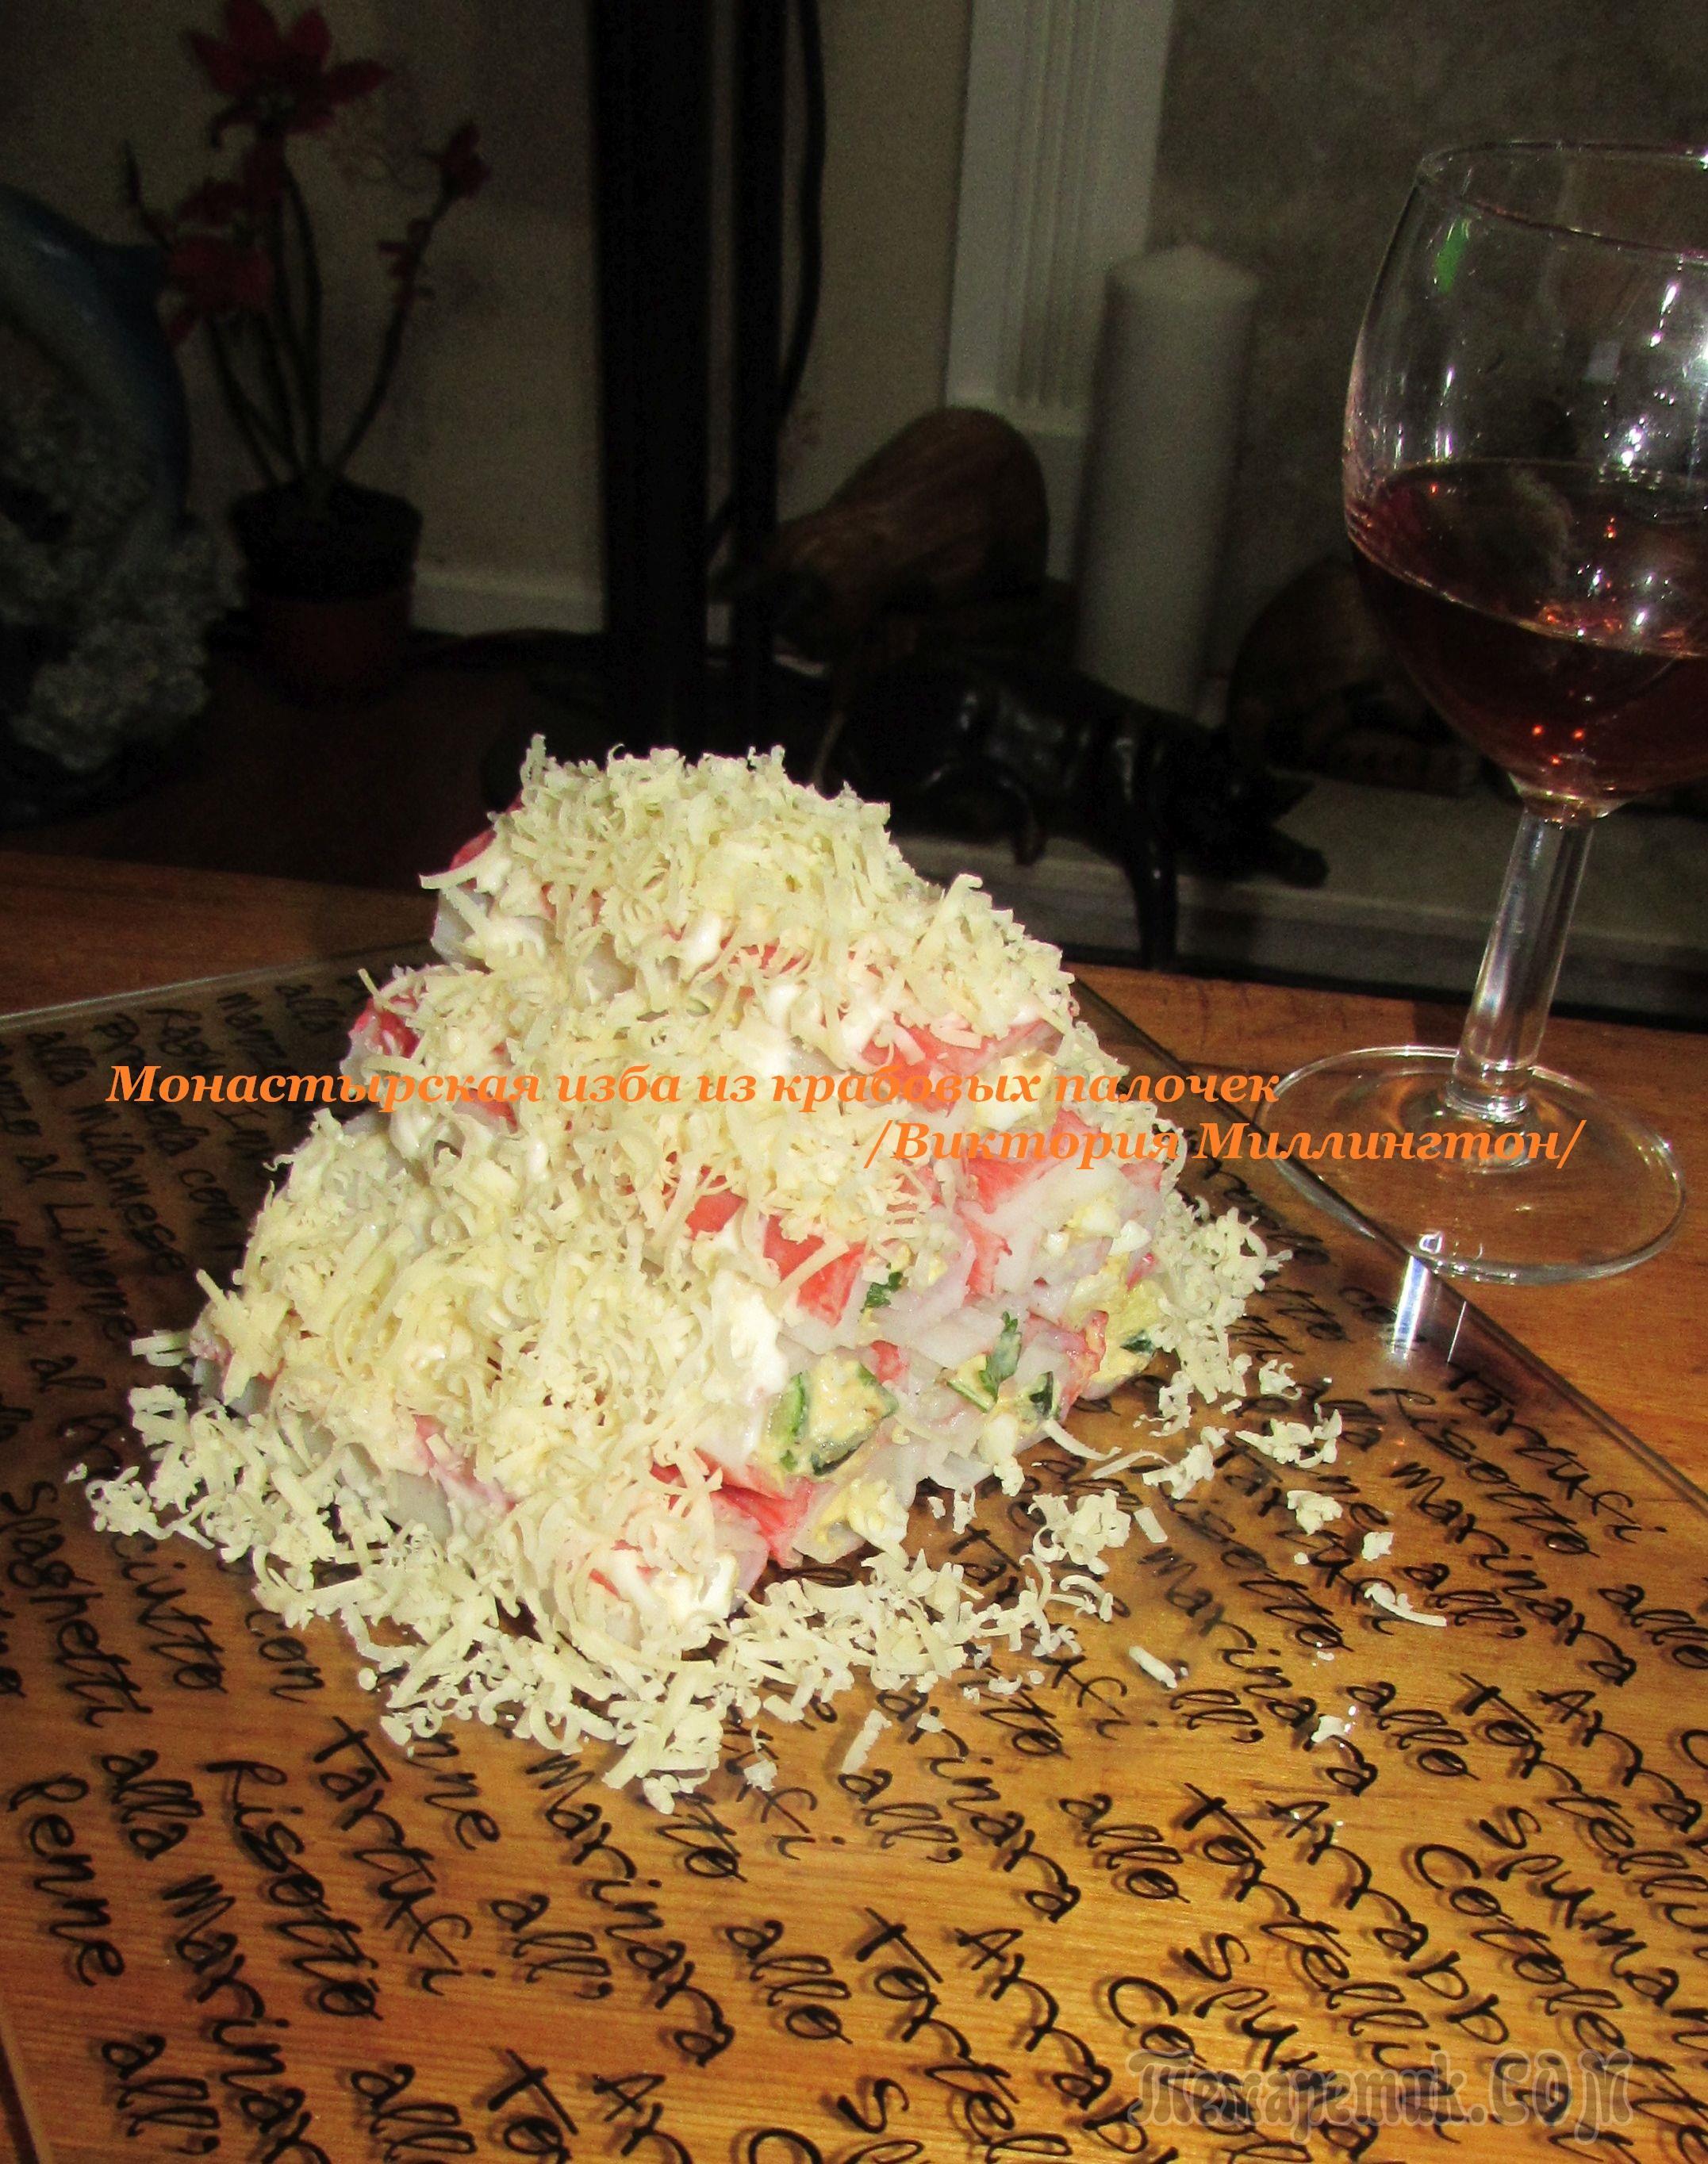 Монастырская изба из крабовых палочек рецепты